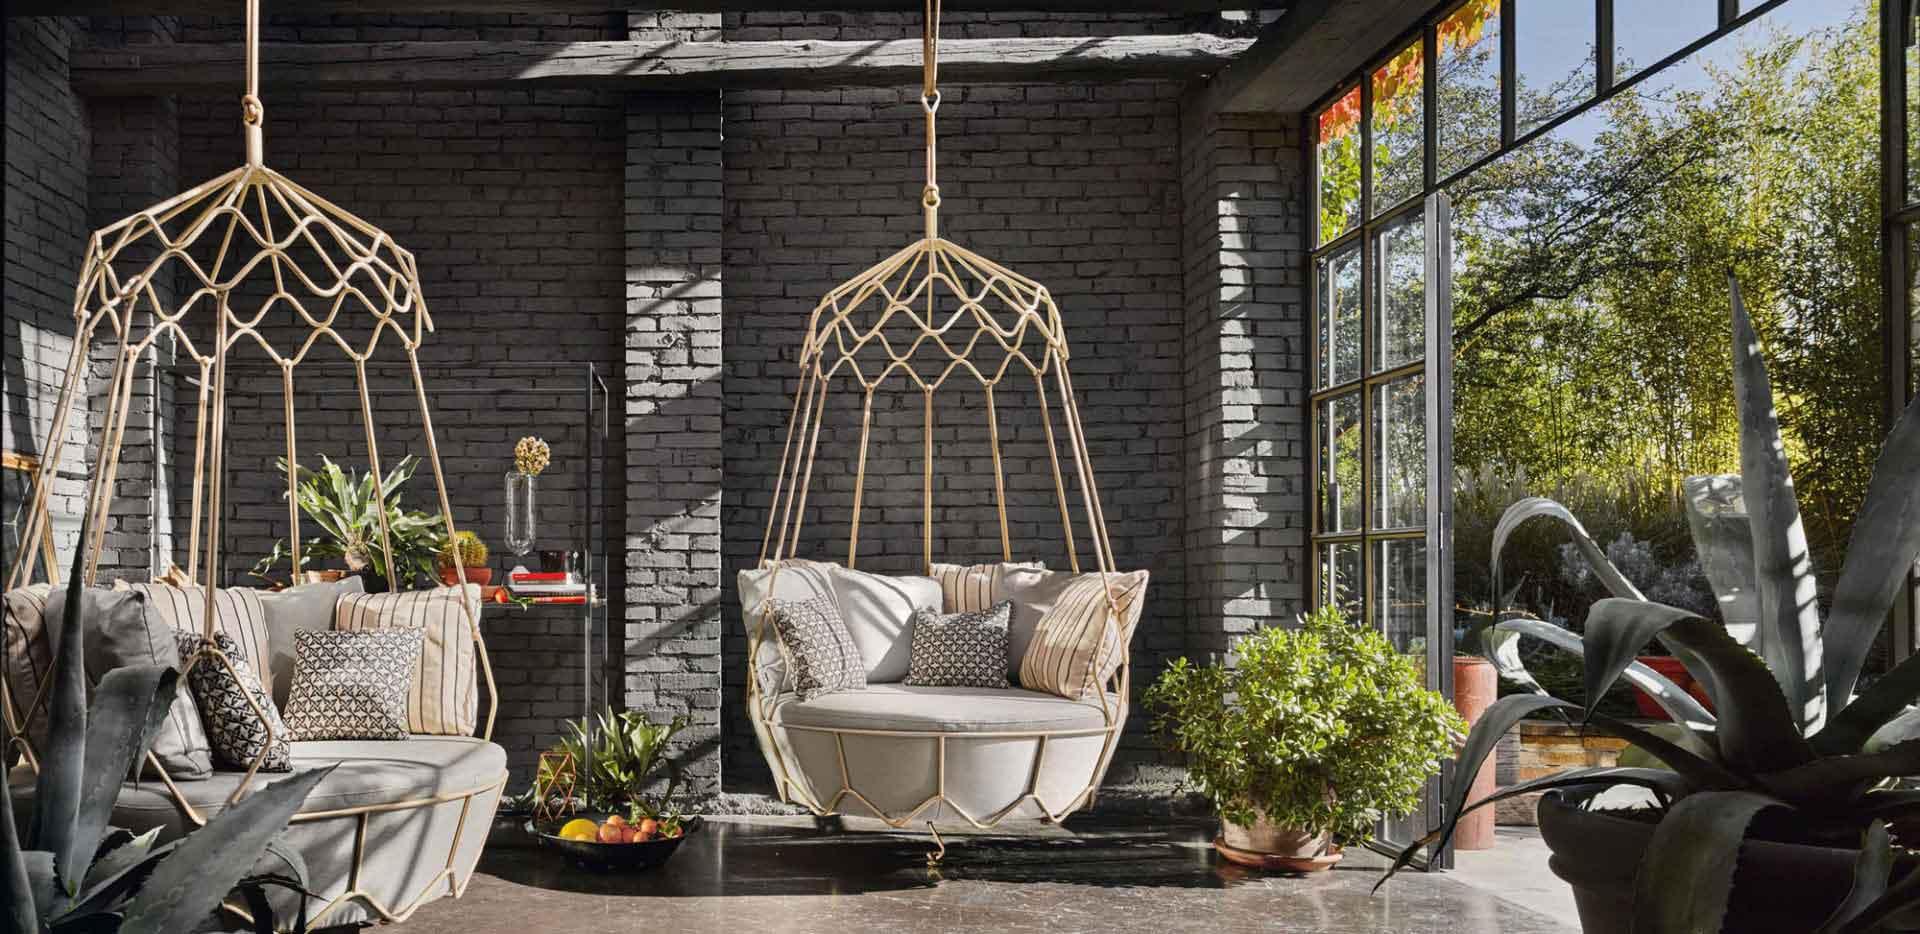 modern and stylish hanging chair, swing chair, rope chair, kremasti karekla, kinoumeni karekla, karekla tavaniou, karekla me sxoinia, kremamameni polithrona, polithrona kremasti, rope hanging swing chair,